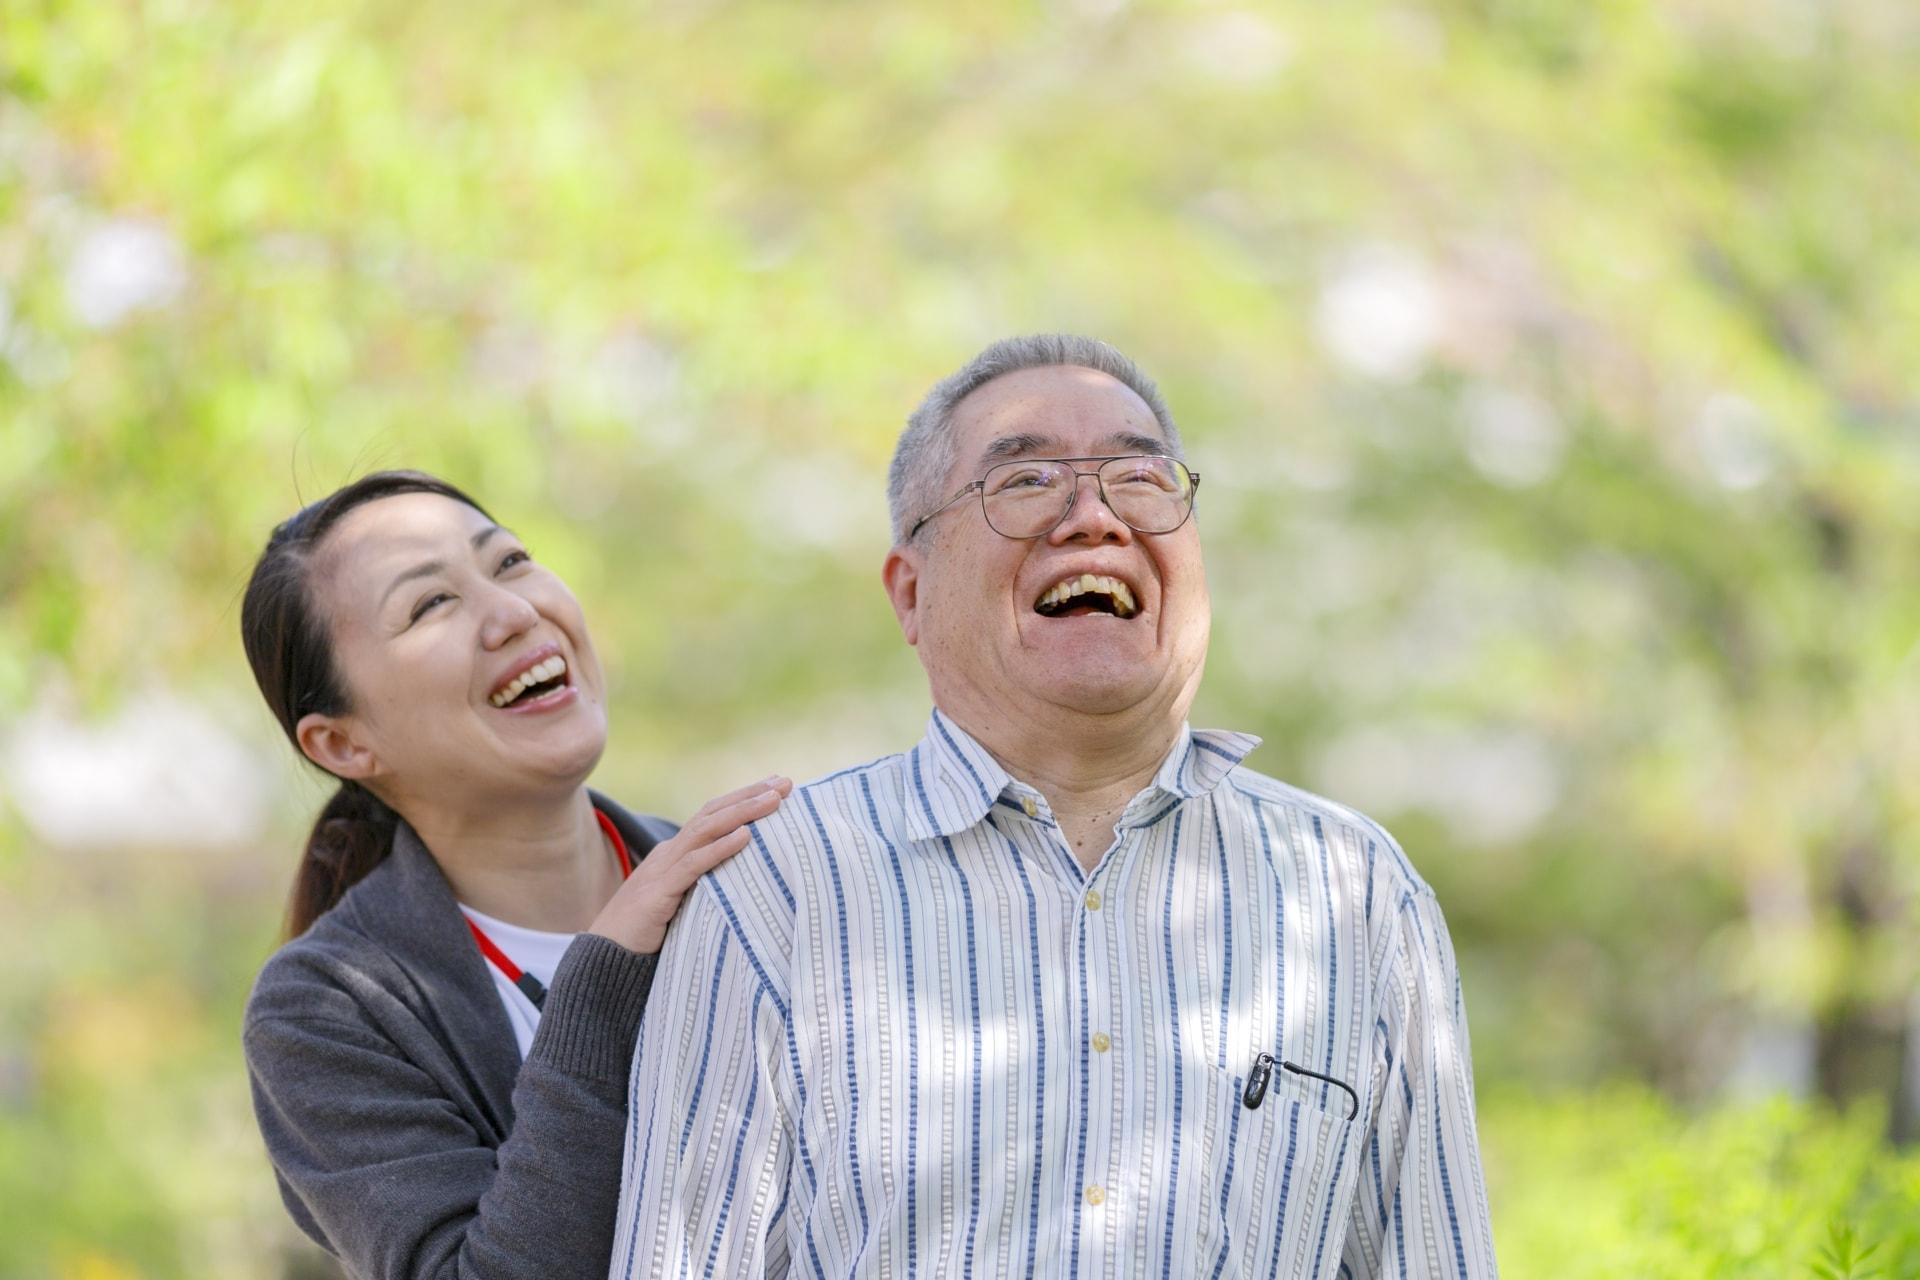 【個人年金保険】個人年金保険の据置期間と据置期間の再設定